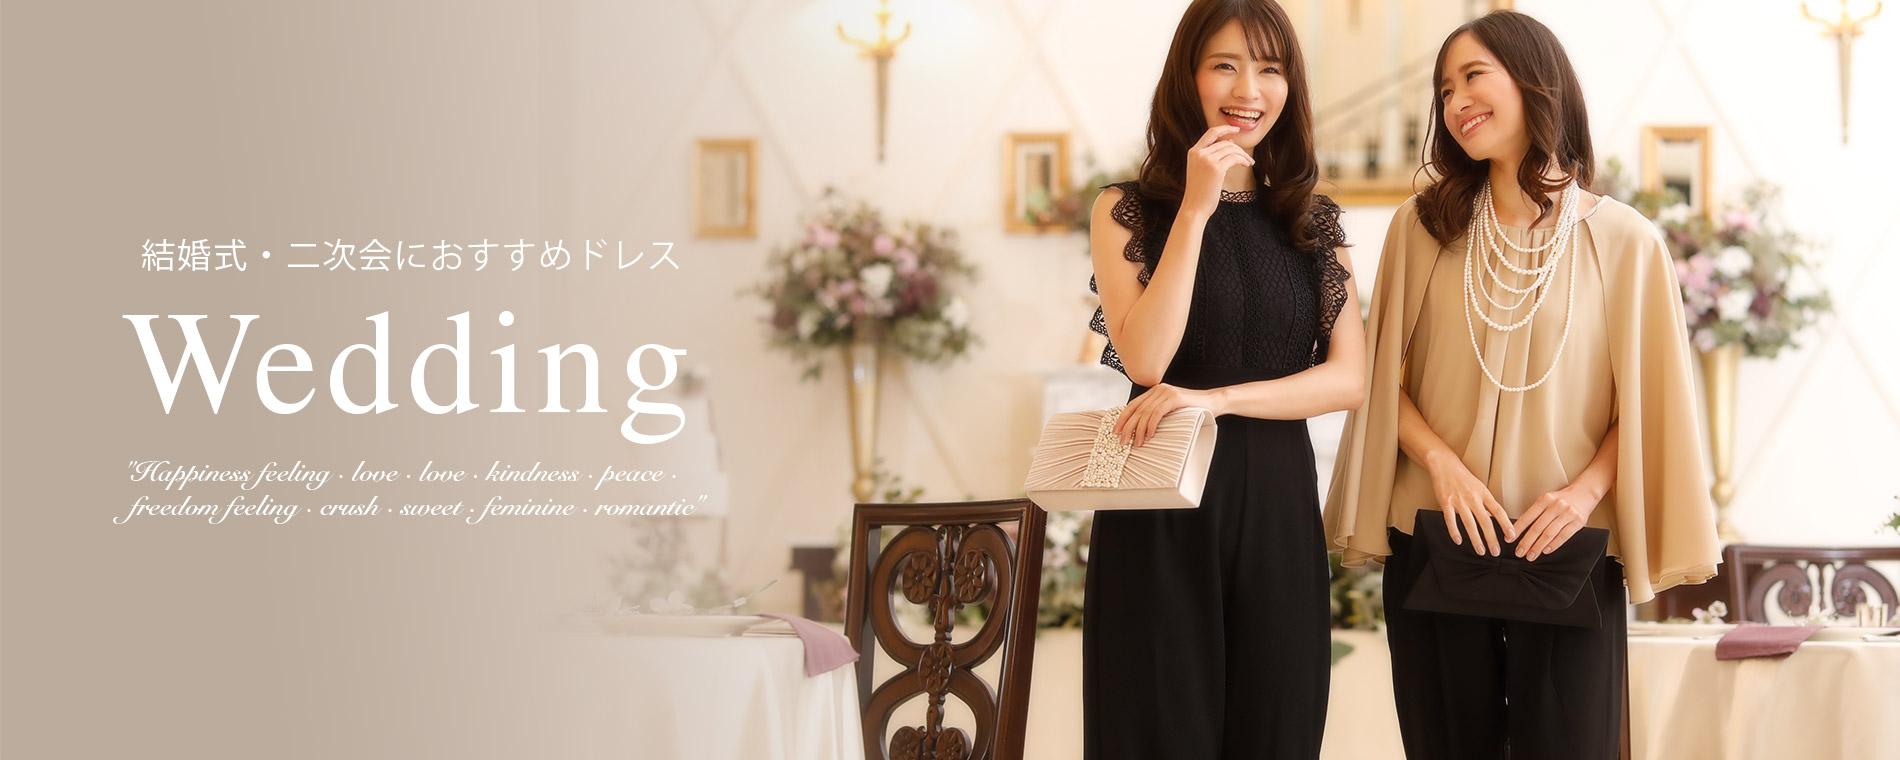 Retica(レティカ) 結婚式・二次会におすすめのドレス特集